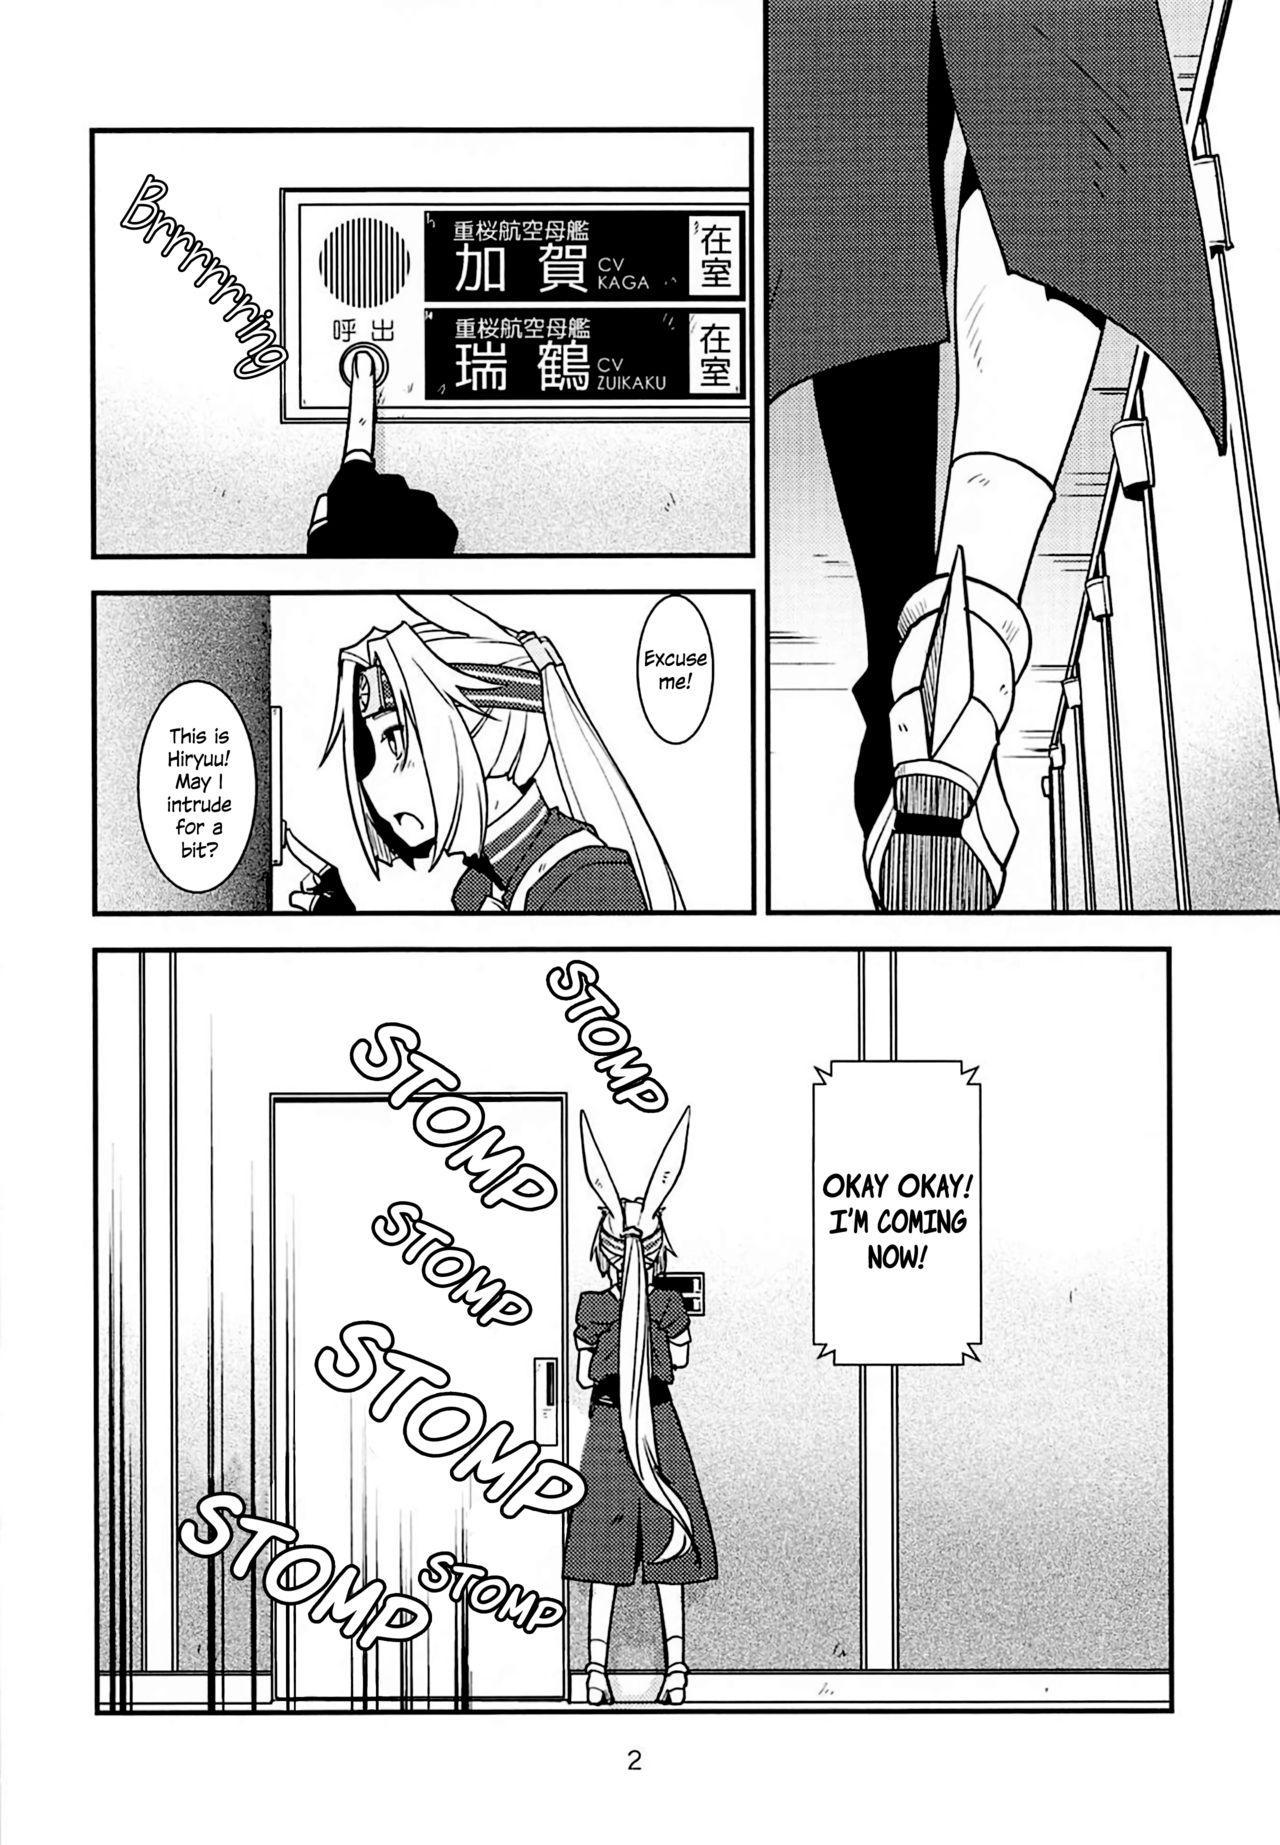 Kimi-tachi wa Hontou ni Ecchi da na!! | The Two Of You Are So Lewd! 3